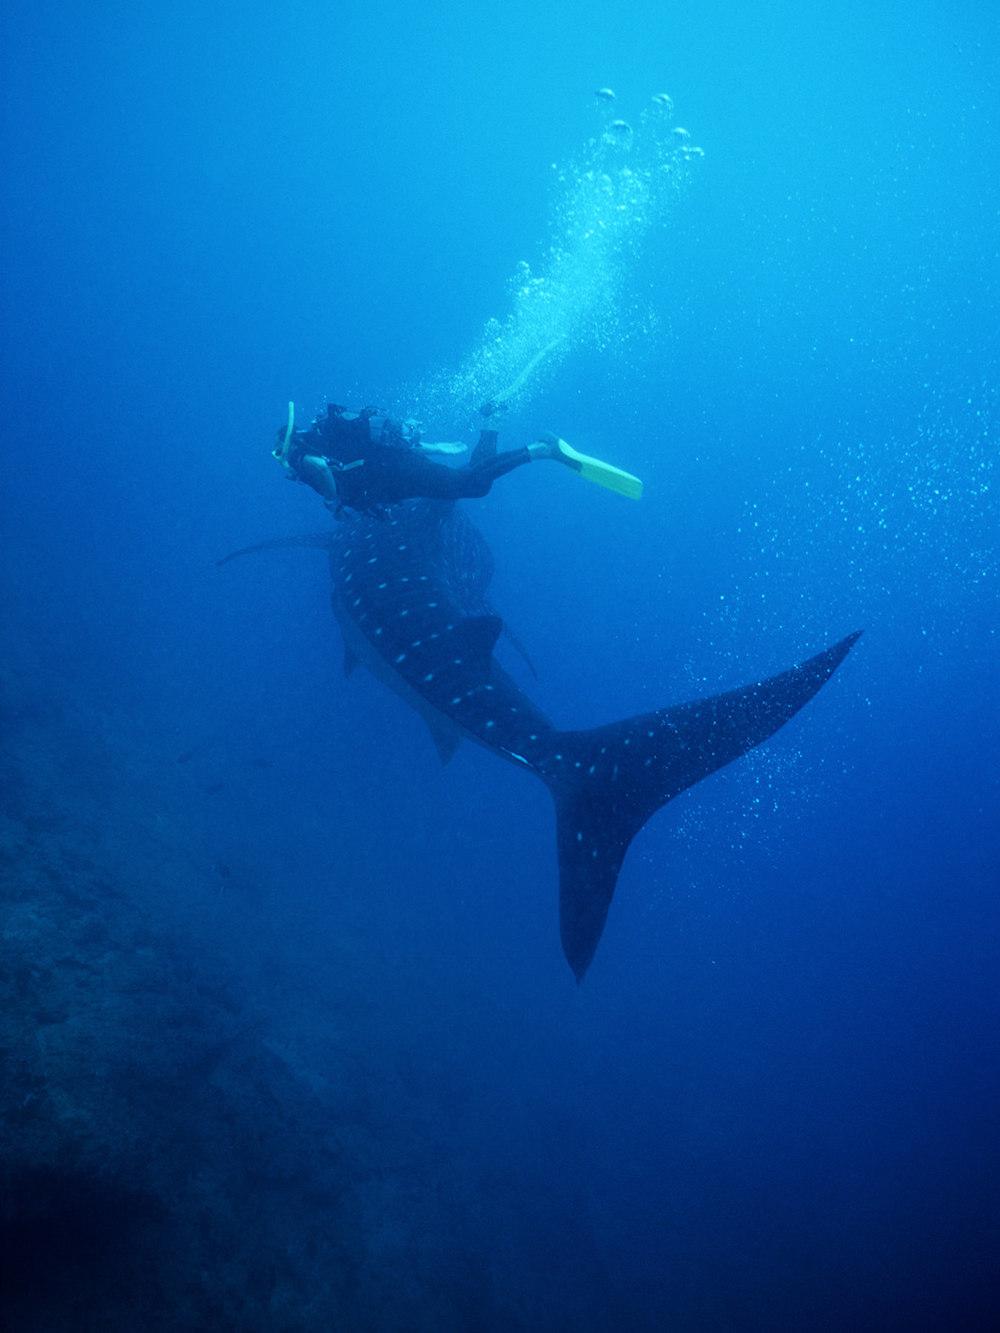 whales_3.jpg